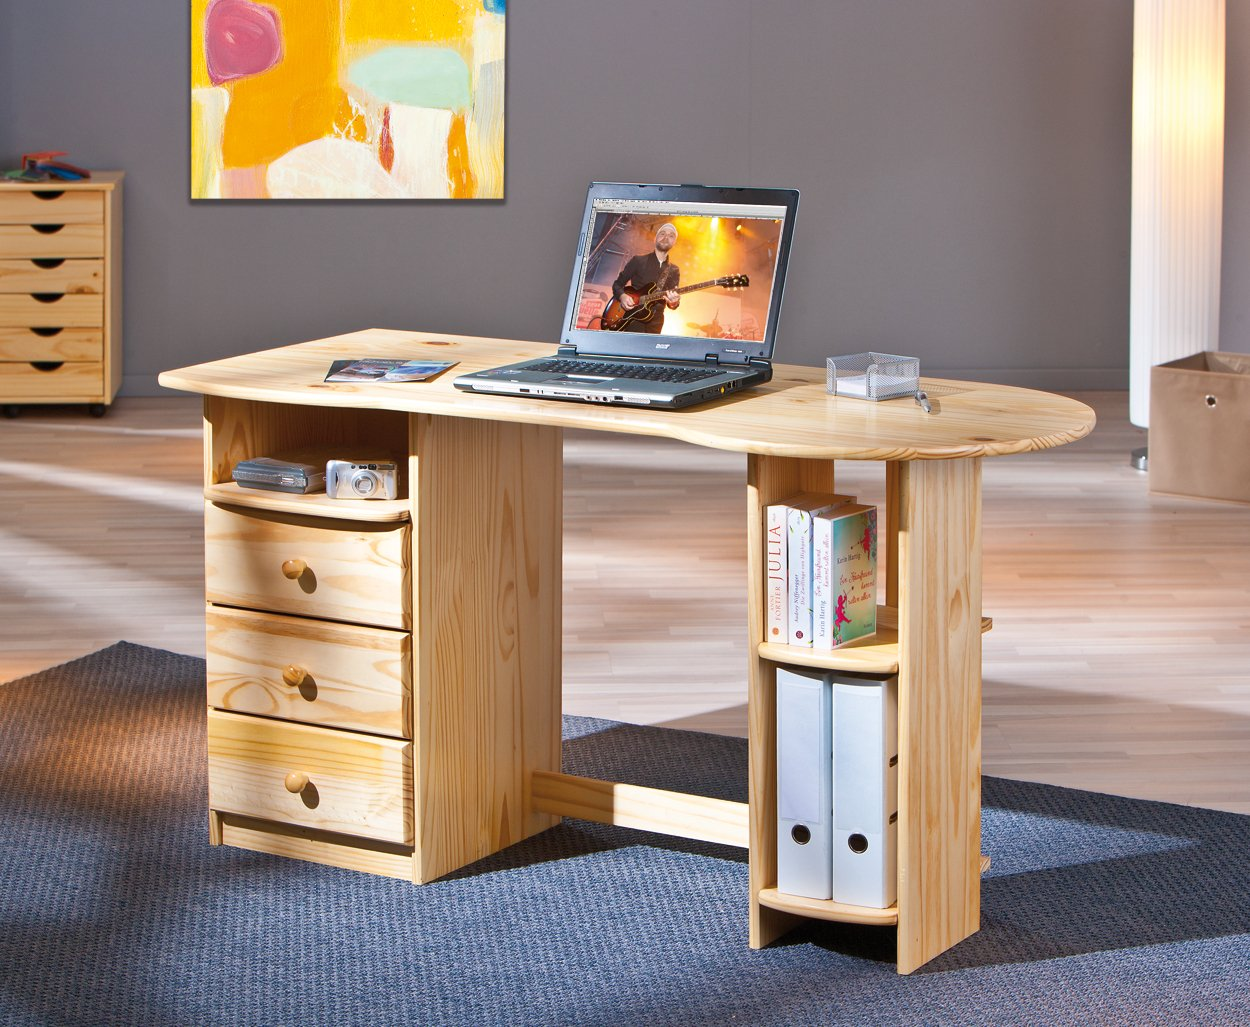 Inter link bureau table de travail pin massif vernis naturel